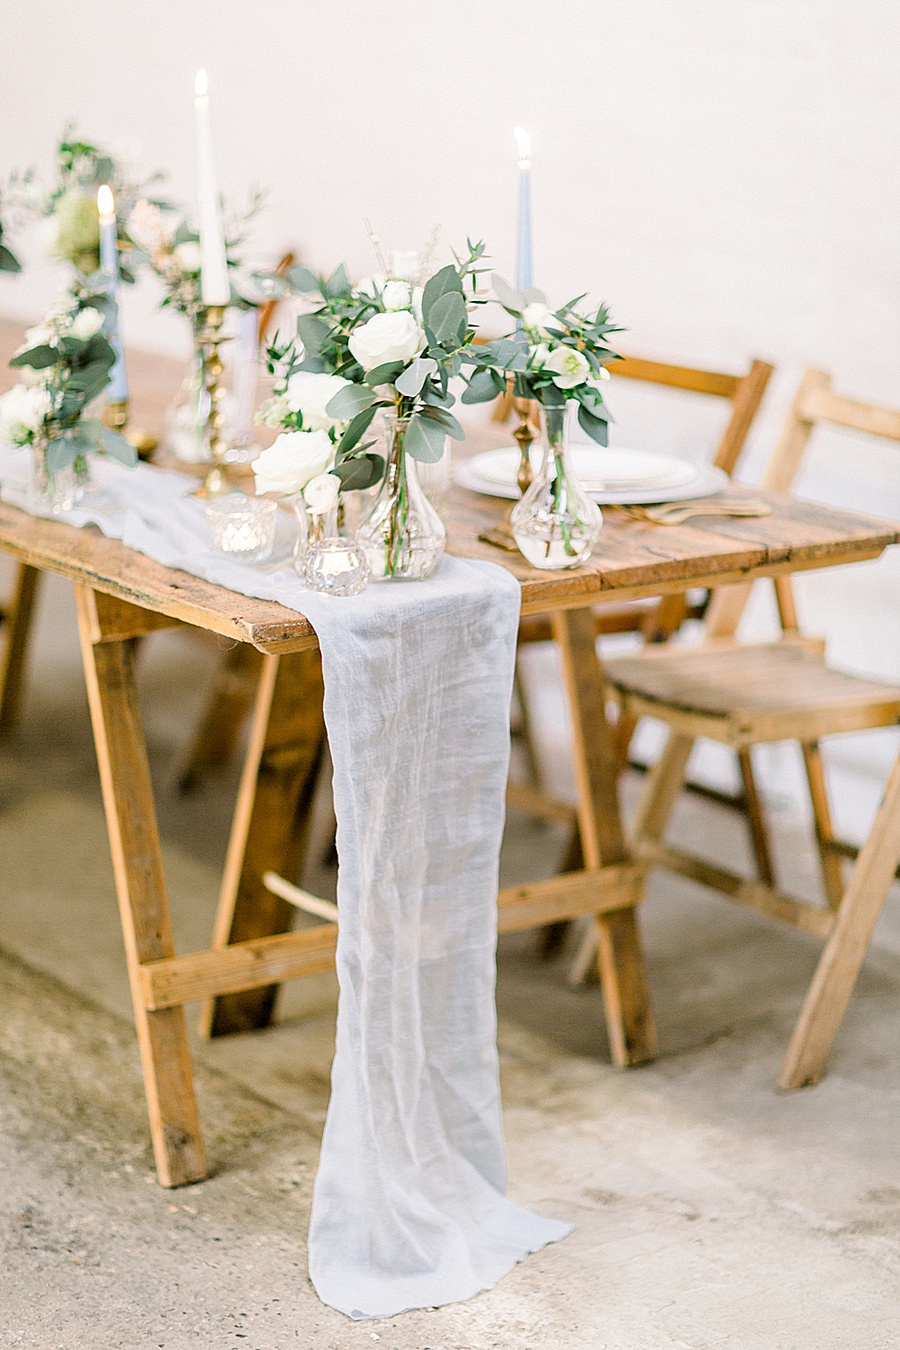 Barn venue transformed for a beautiful modern wedding, photo credit Terri and Lori (10)